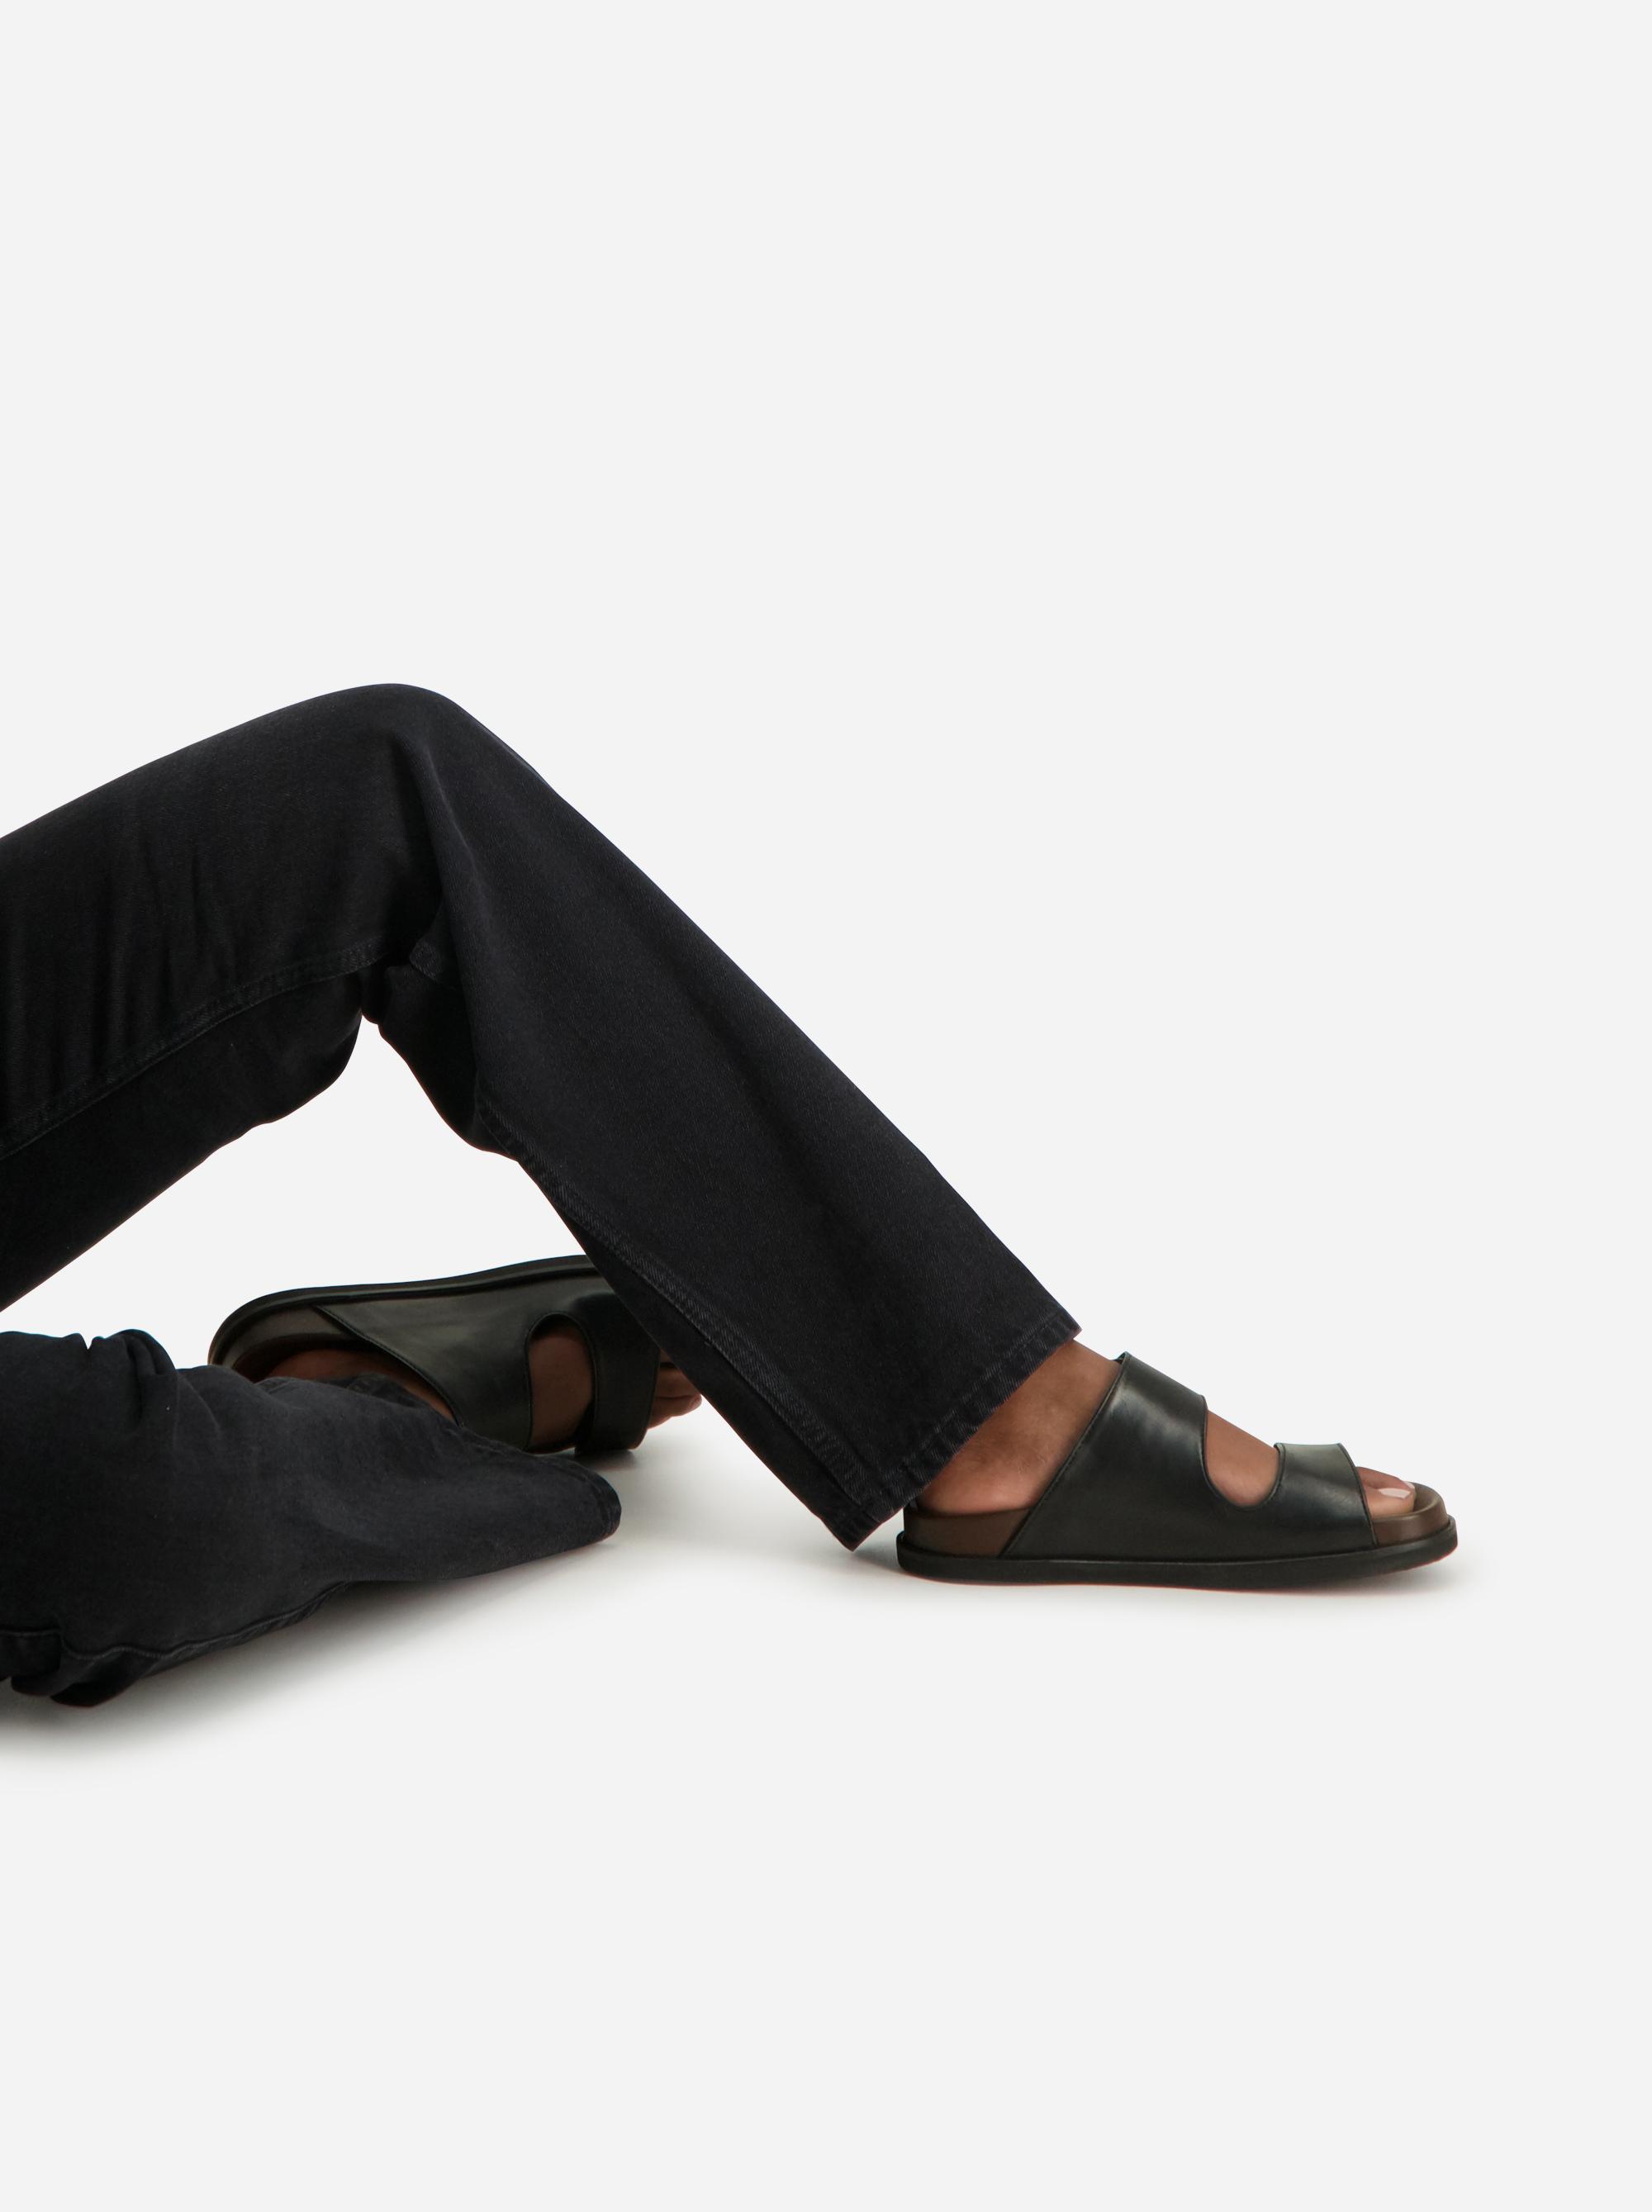 Teym - The Sandal - Women - Black - 2